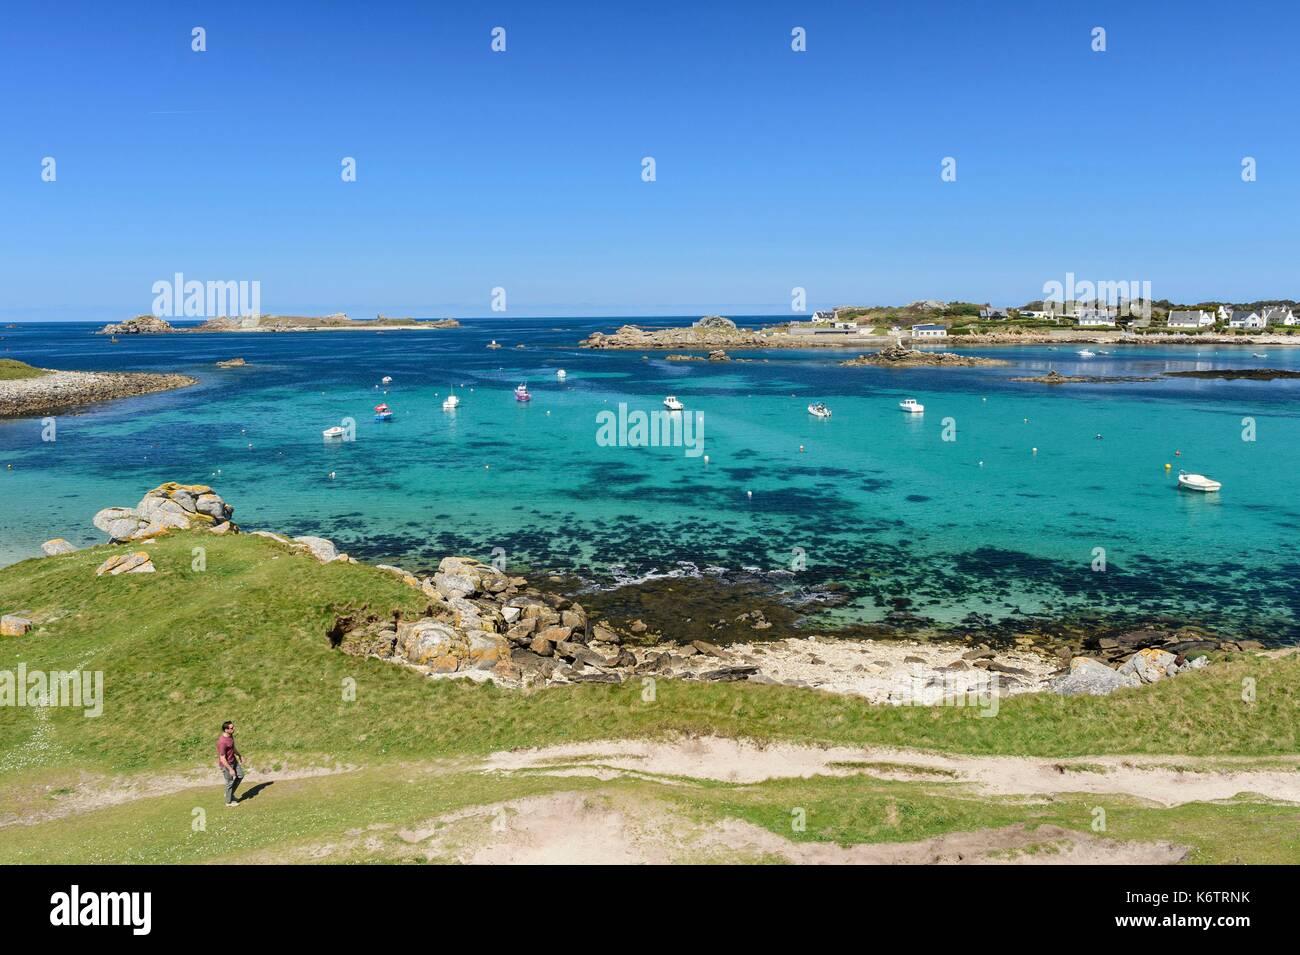 France, Finistre, Porspoder, Saint-Laurent peninsula - Stock Image